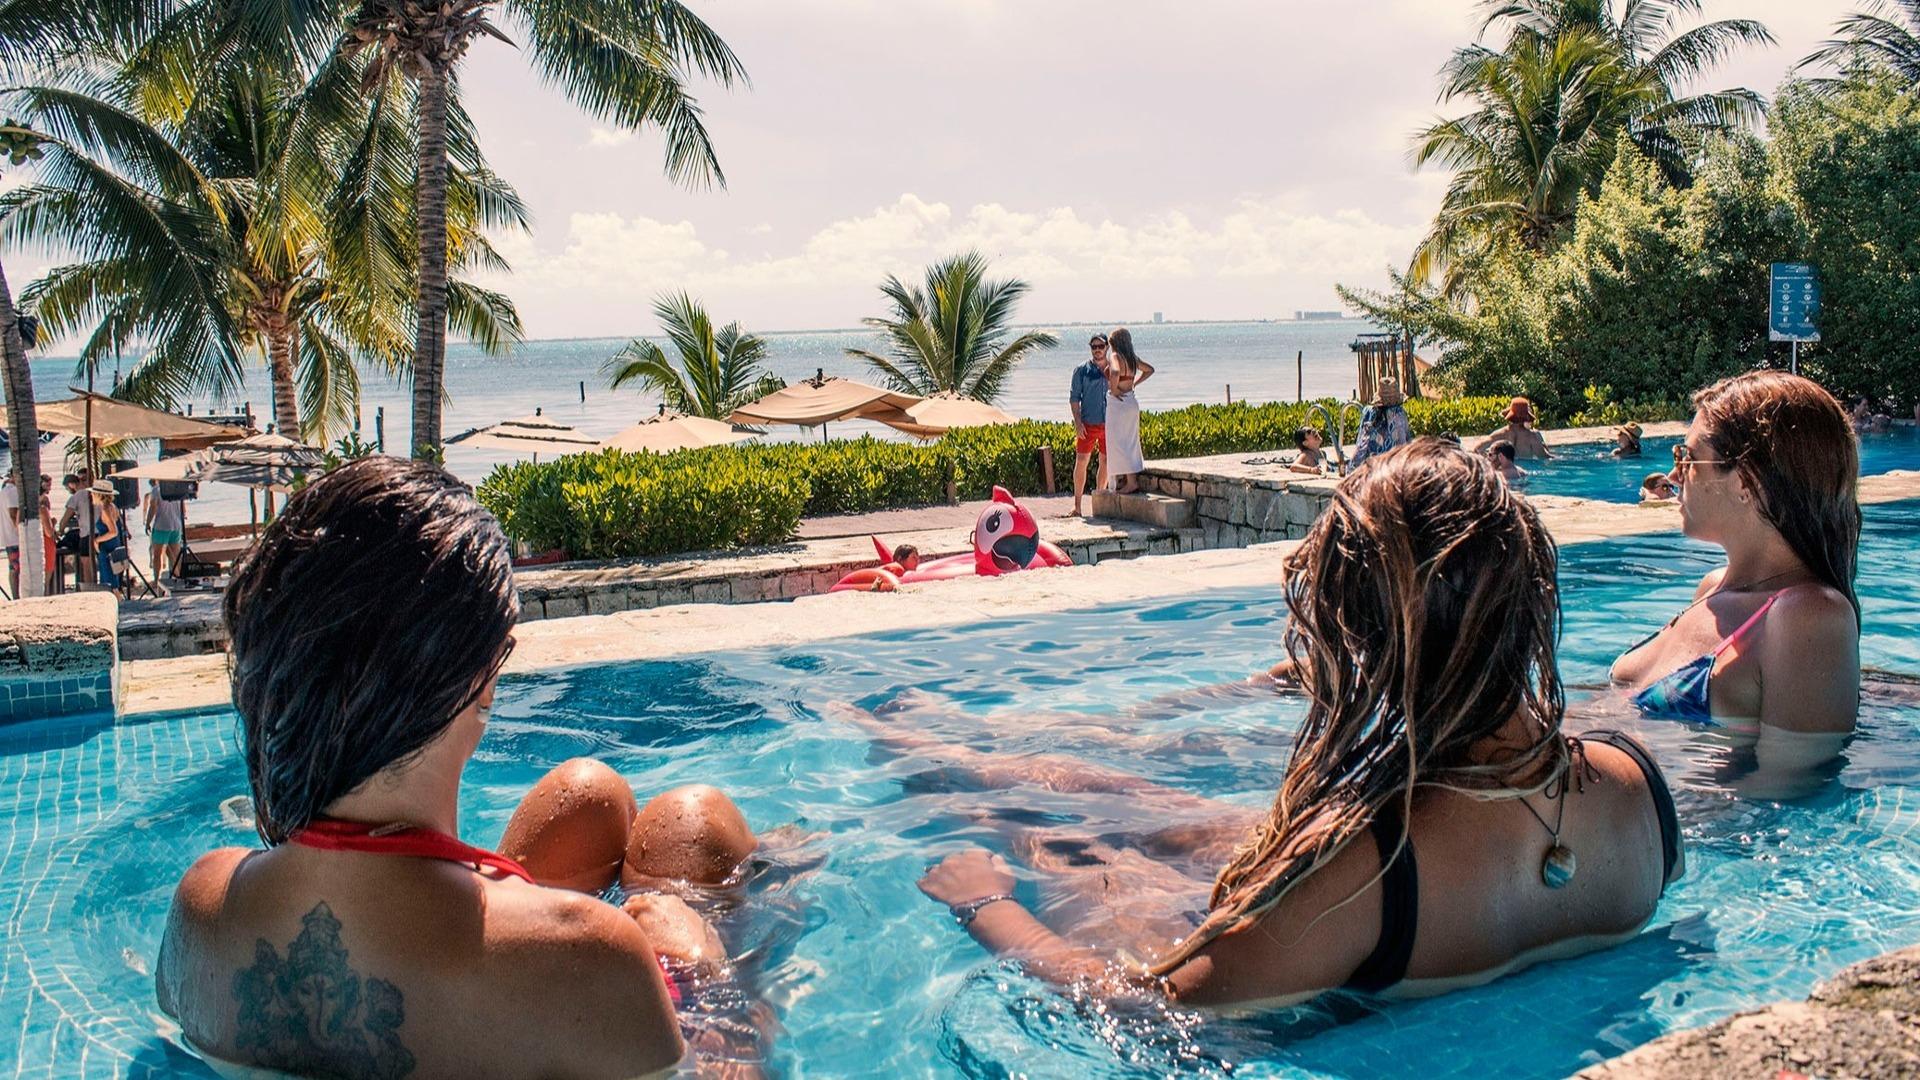 LowRes zama-beach-club-isla-mujeres-relaxing-cancun-sailing-1-1